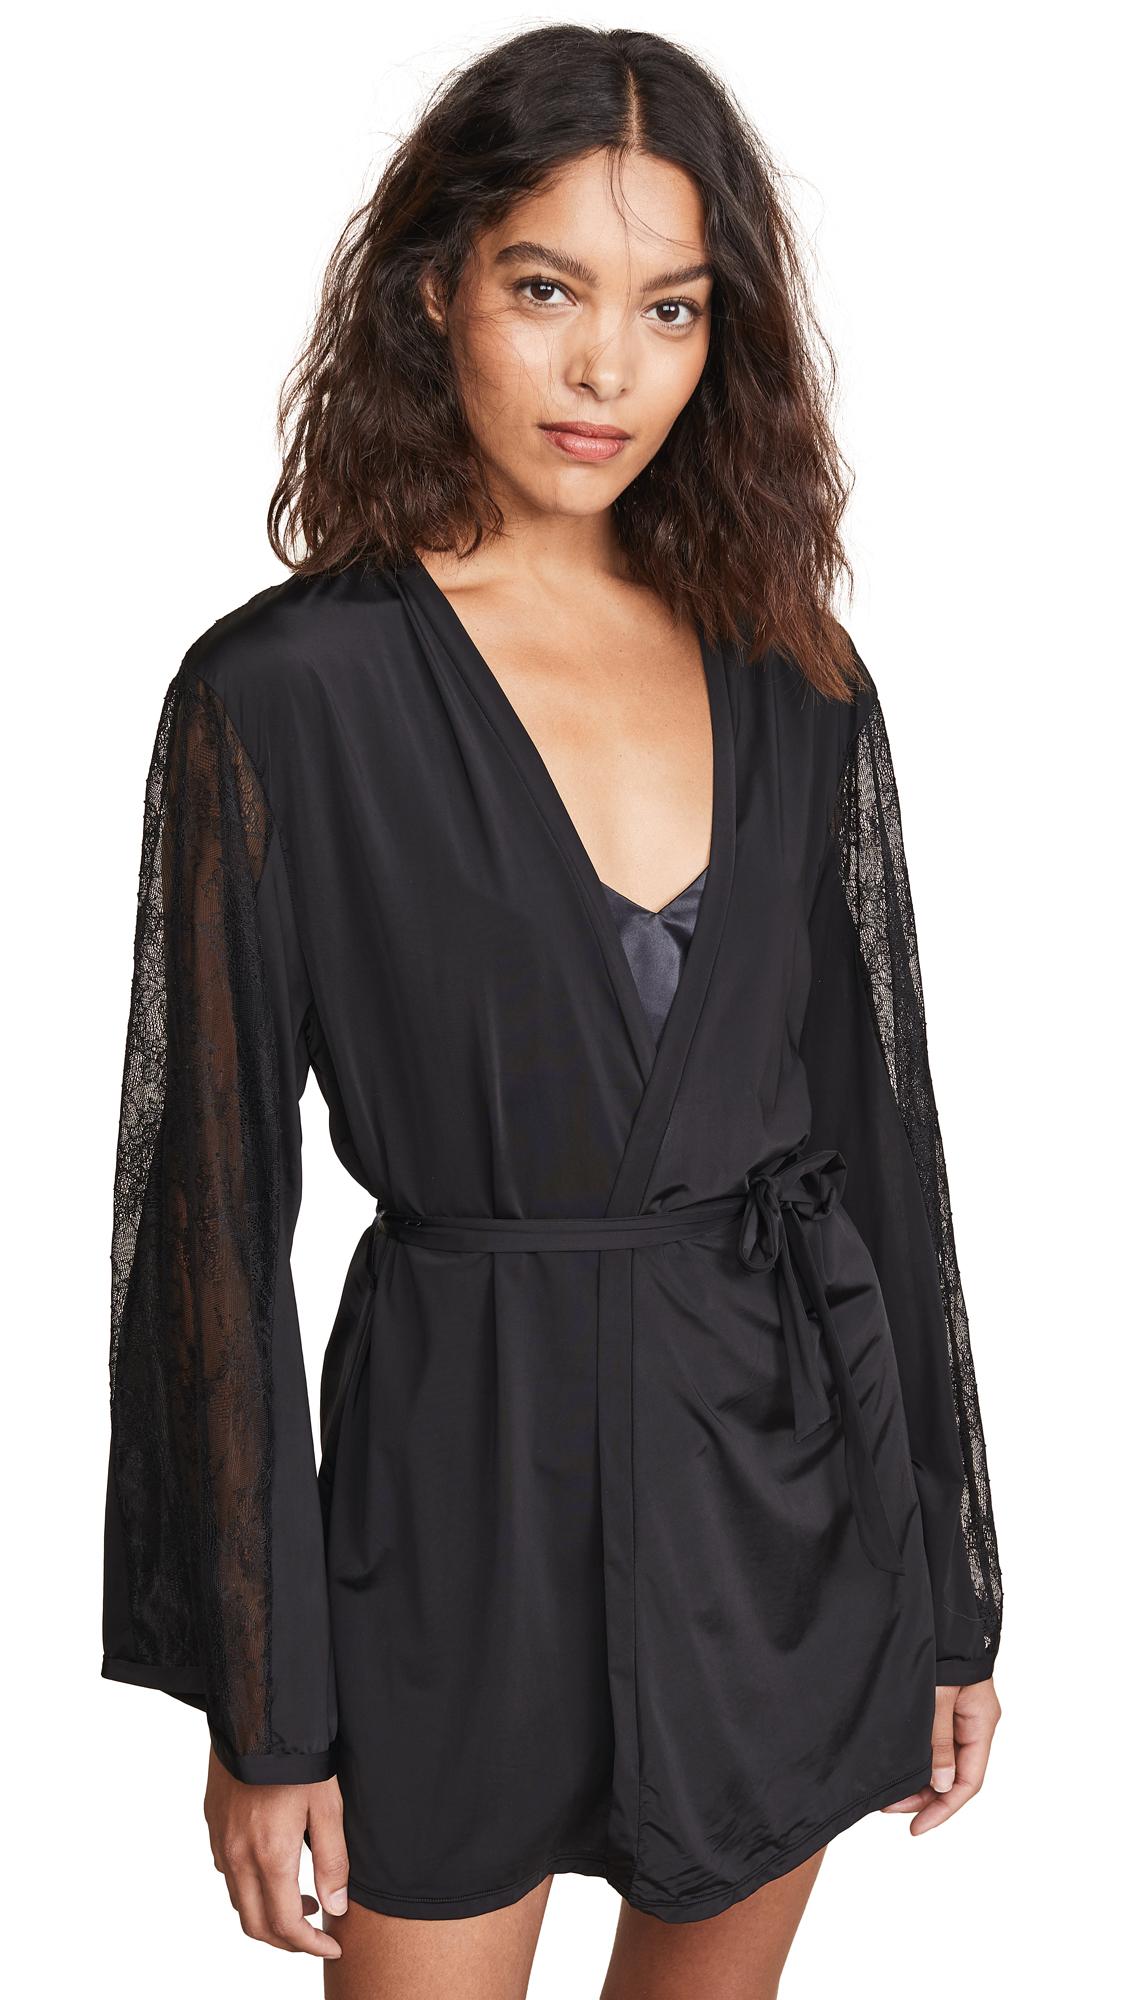 Bluebella Nyane Robe - Black